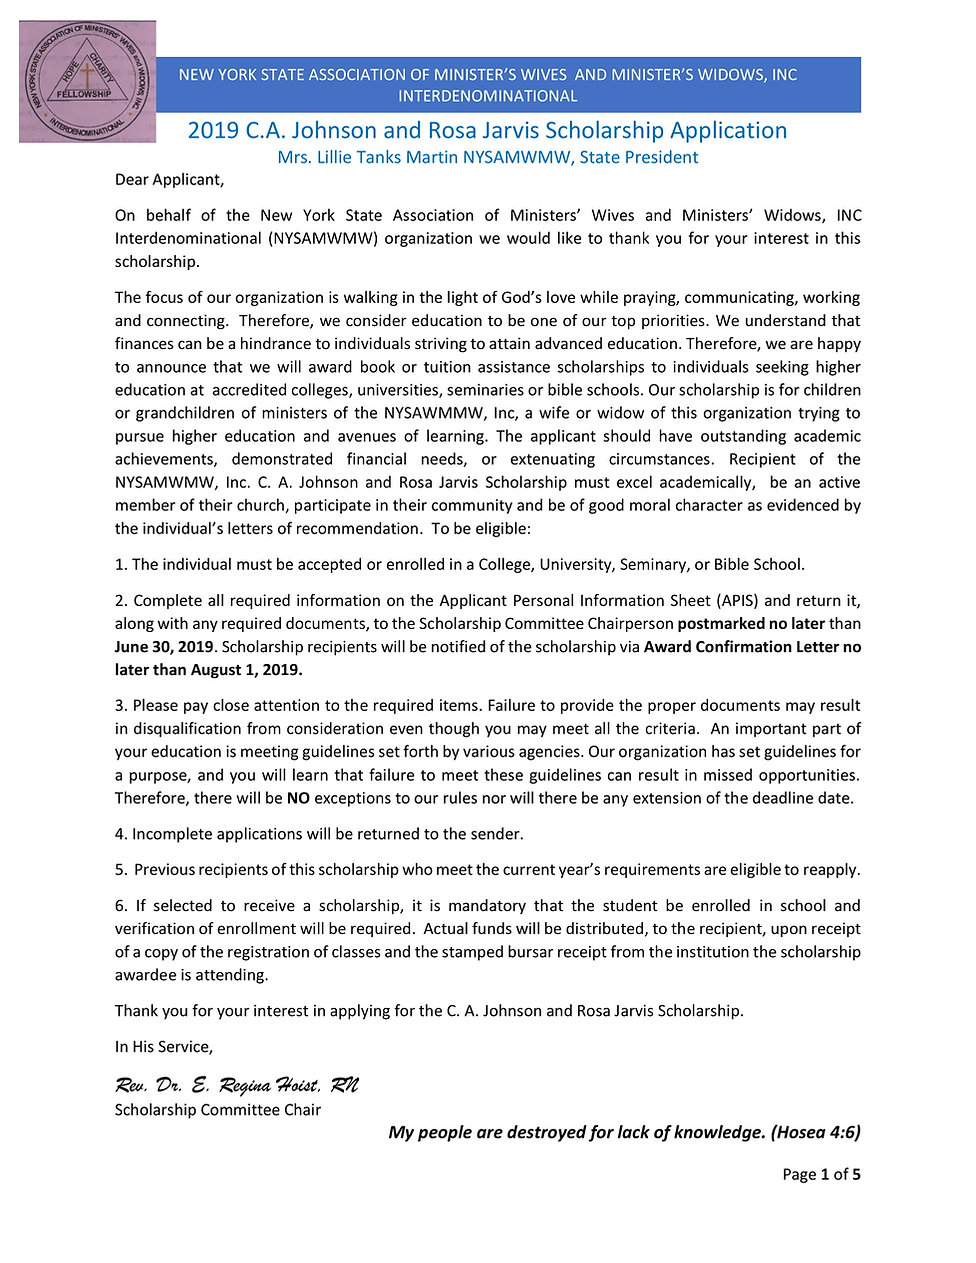 NYSAMWMW Scholaship Application-1.jpg